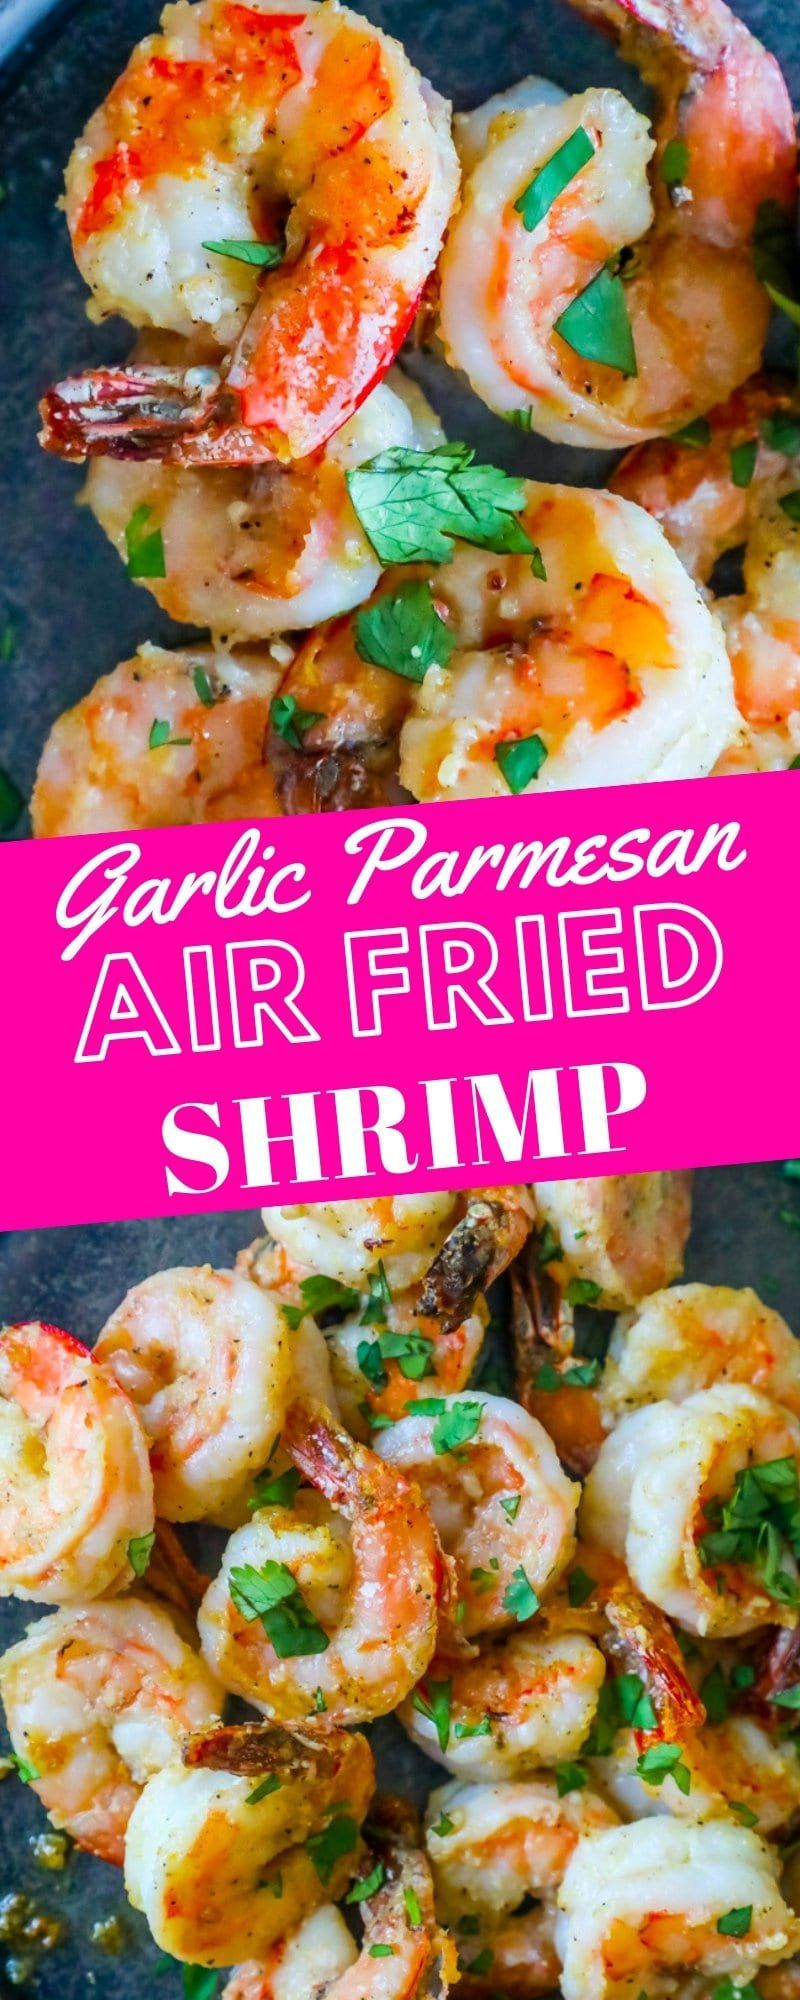 Garlic Parmesan Air Fried Shrimp Recipe - Sweet Cs Designs